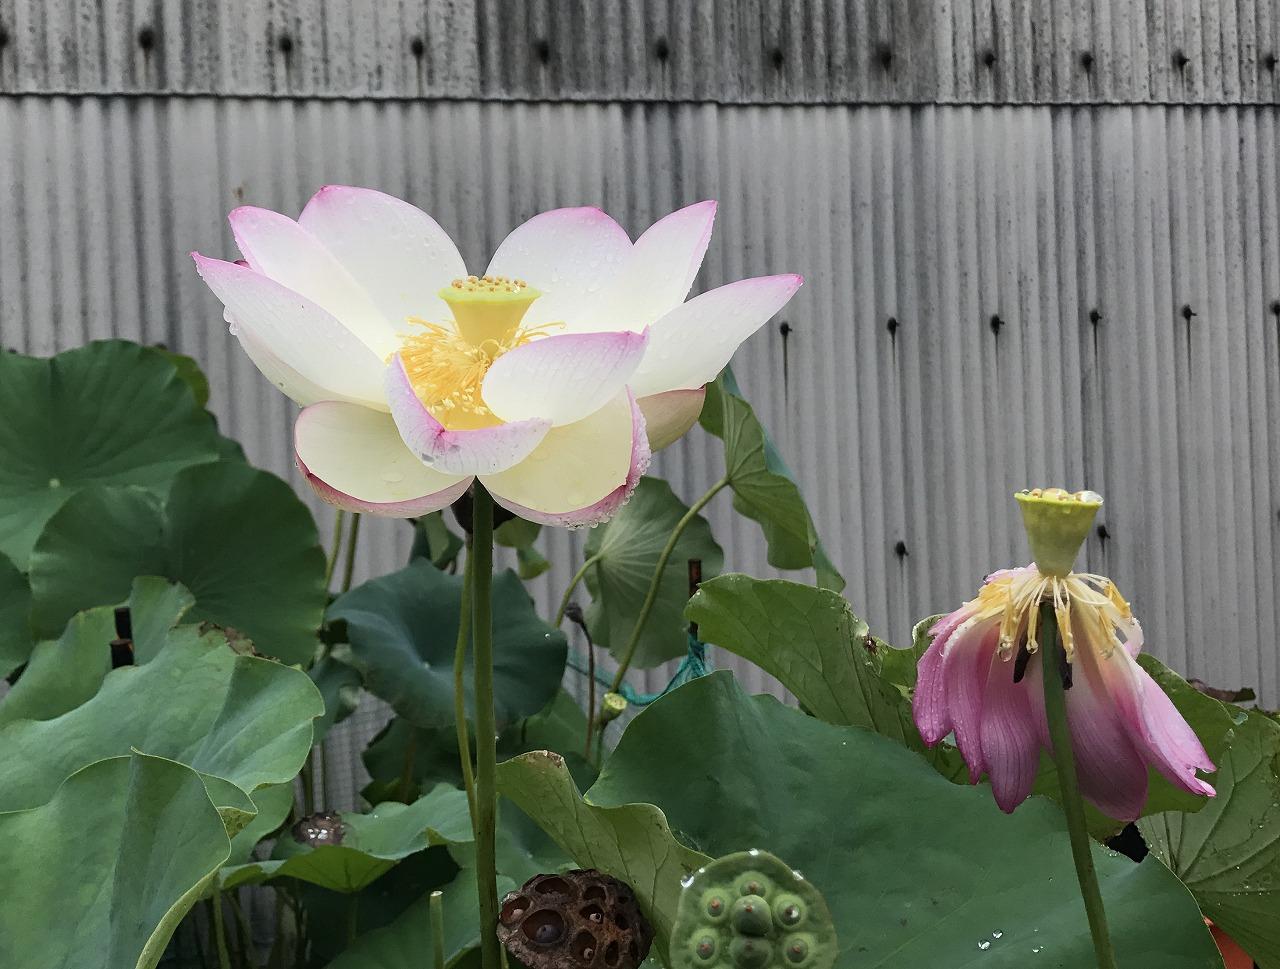 20170814-Lotus_TsumabeniChawanbasu-I01.jpg